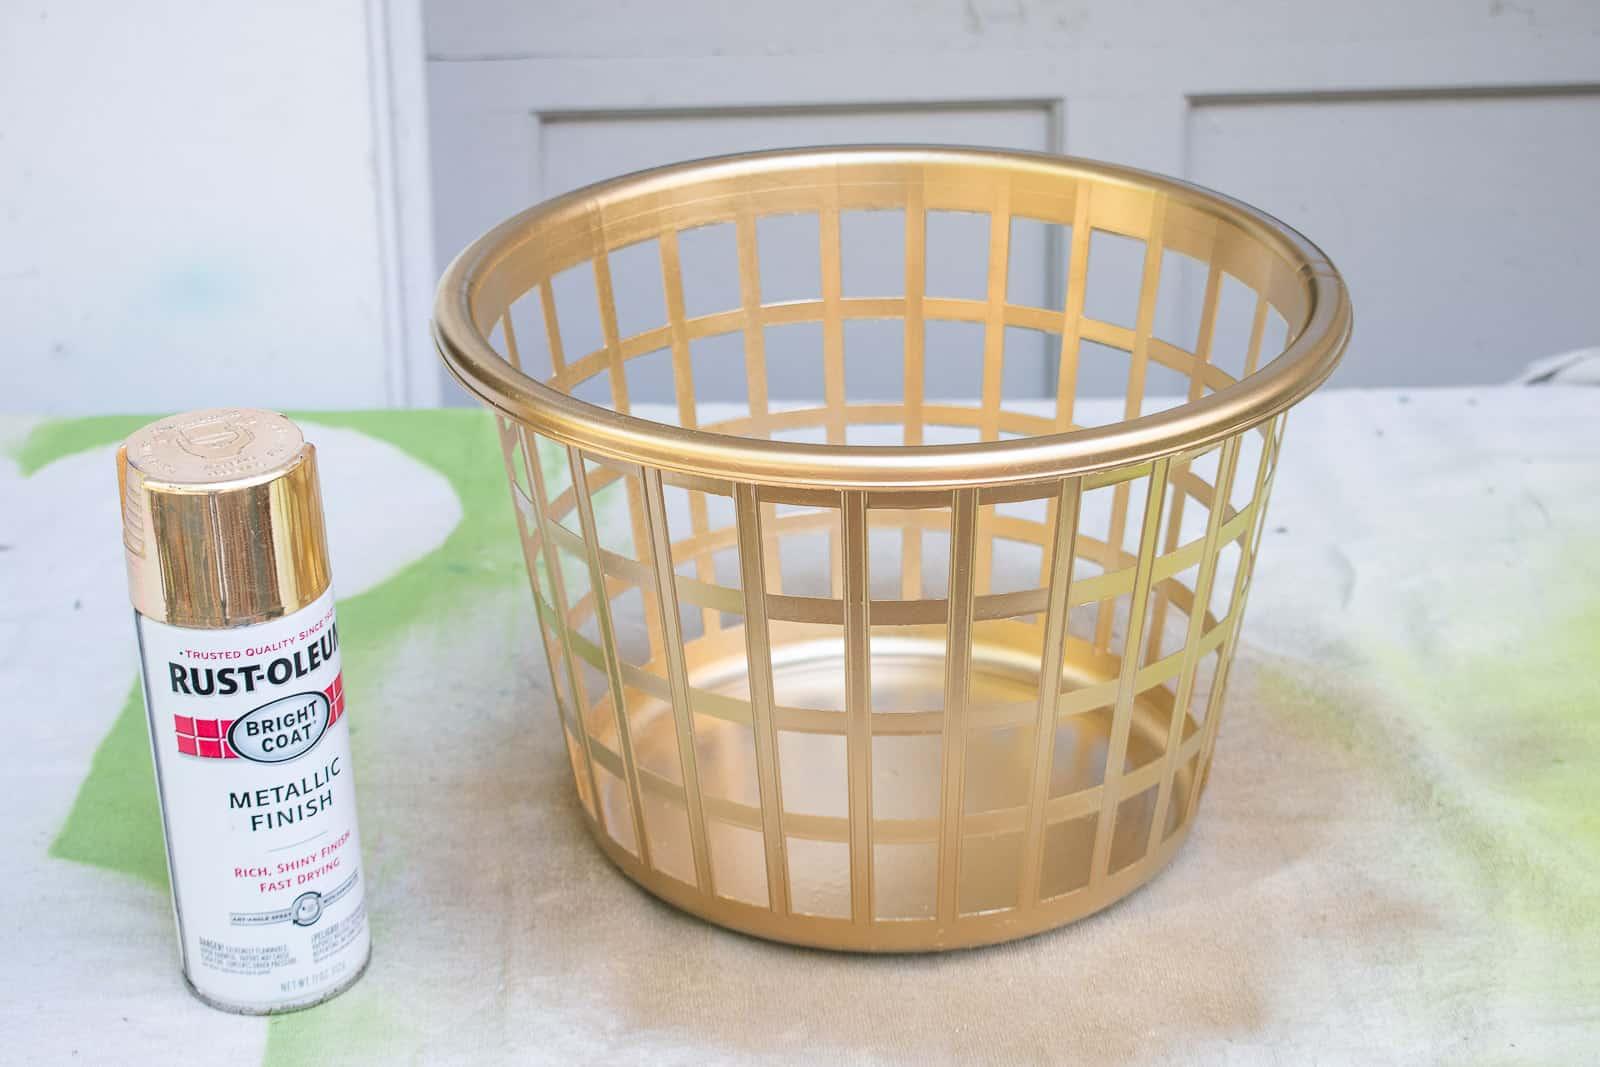 spray paint the basket